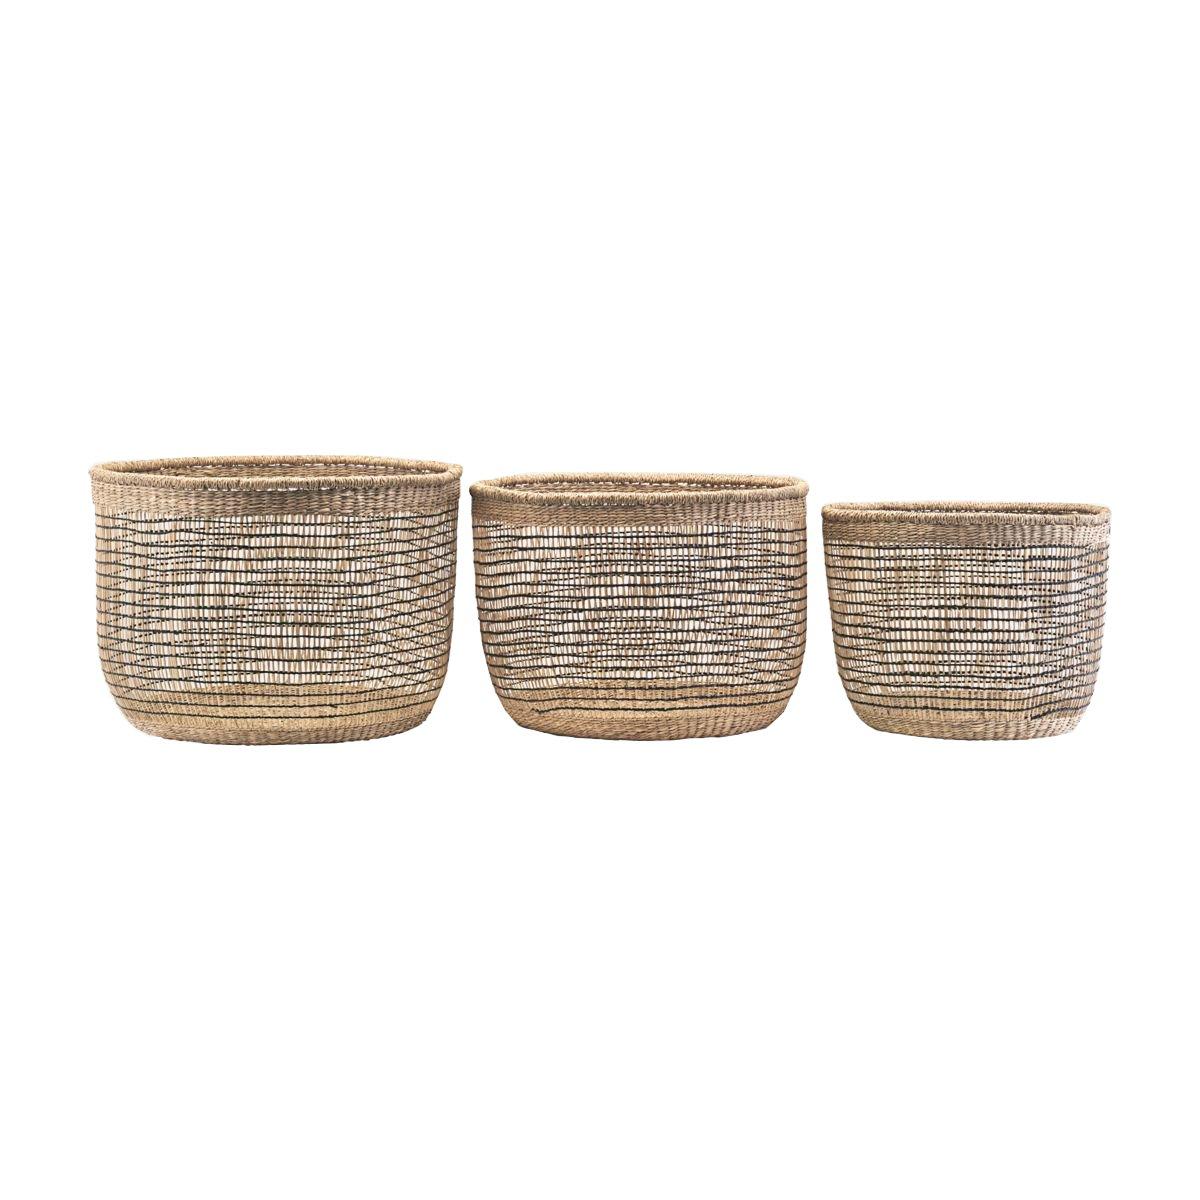 House Doctor - Shape Mix Basket Set Of 3 - Nature (At5201/209805201)